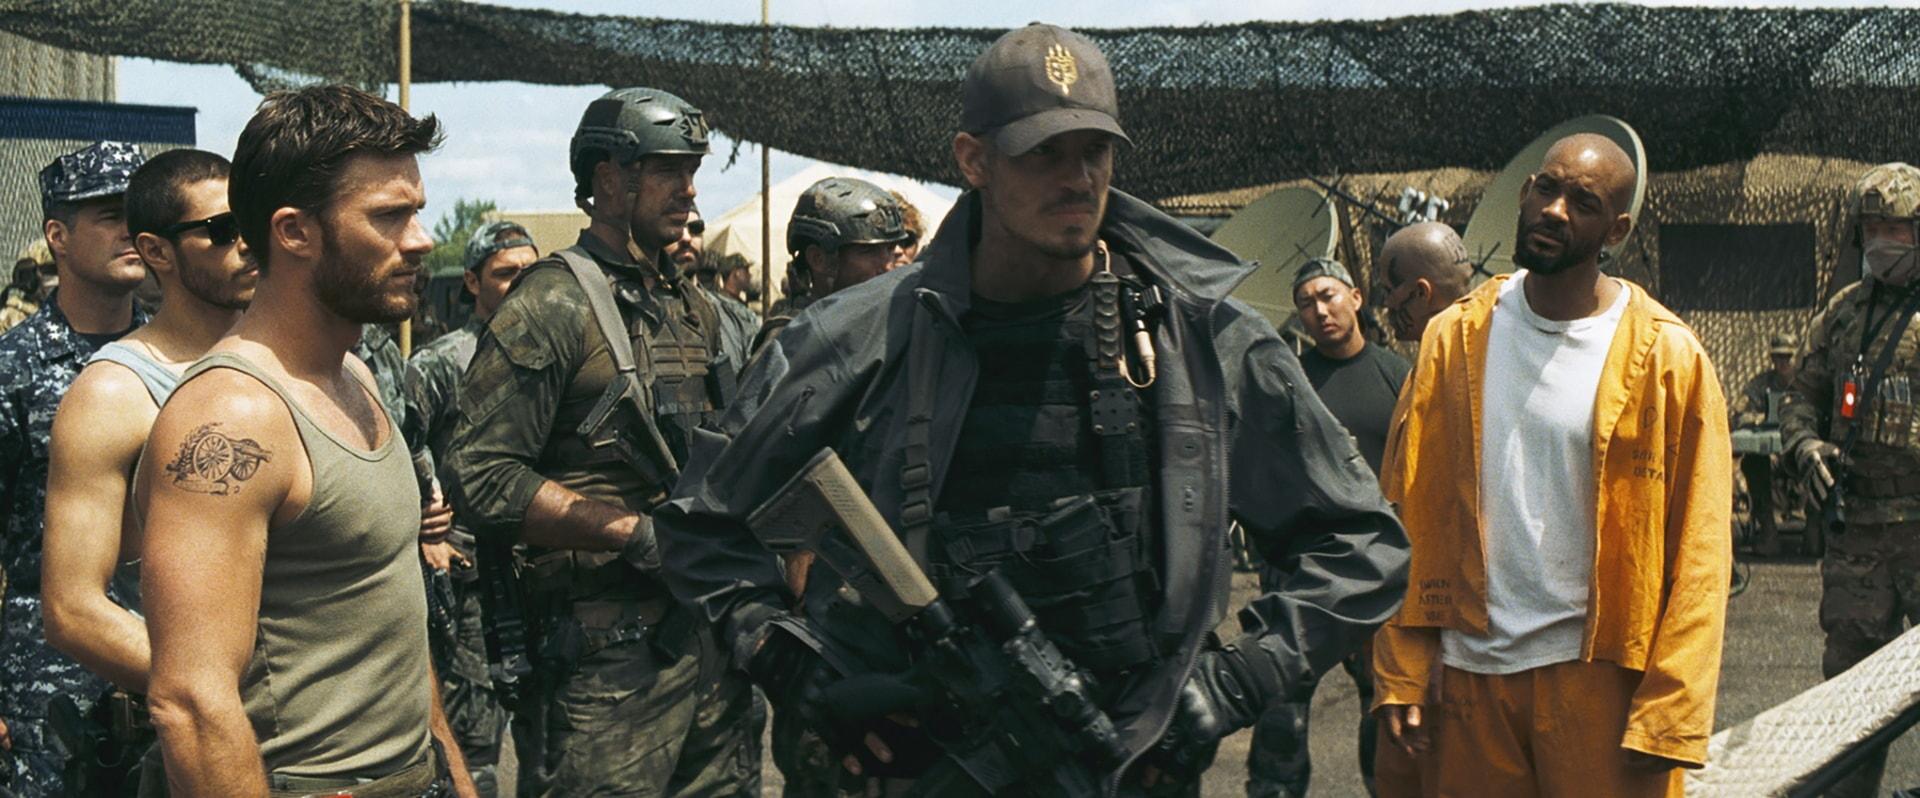 SCOTT EASTWOOD as Lieutenant GQ Edwards, JOEL KINNAMAN as Rick Flag and WILL SMITH as Deadshot